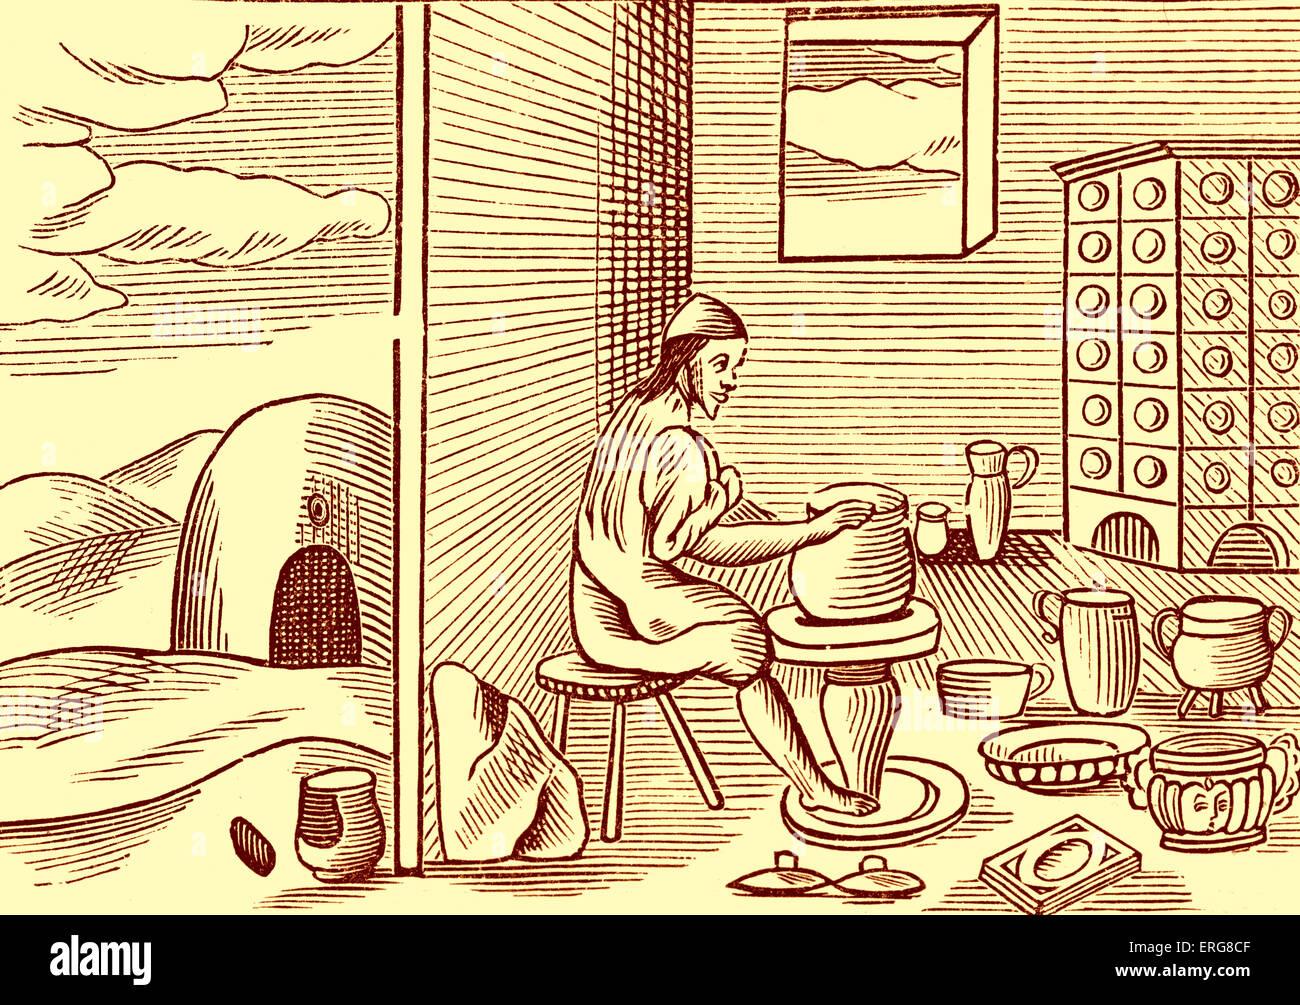 Potter, taken from a 1659 English edition of John Amos Comenius' 'Orbis sensualium pictus', probably - Stock Image